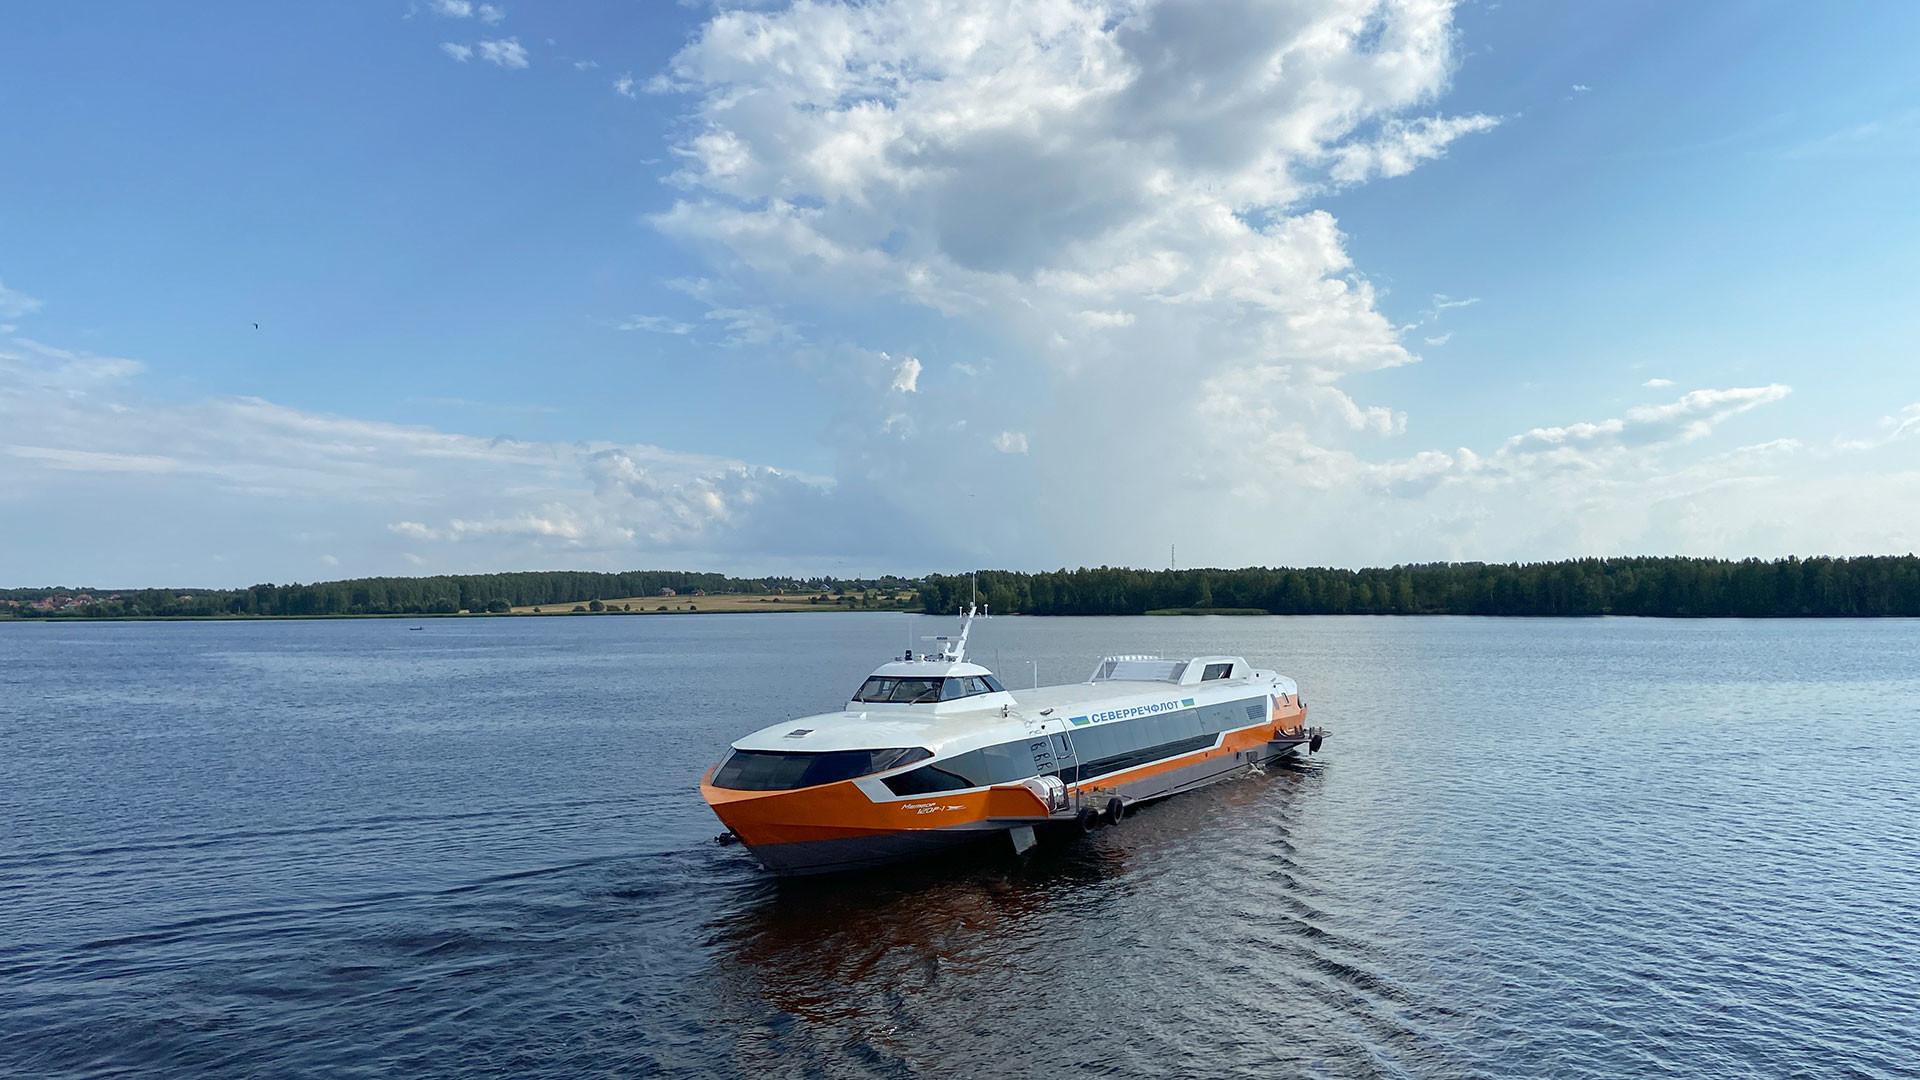 "Rusija, Nižegorodska oblast, 3 kolovoza 2021. Svečano spuštanje na vodu broda s podvodnim krilima ""Meteor 120R"" (brzi putnički brod dizajniran za prijevoz 120 ljudi na udaljenosti do 600 km)."